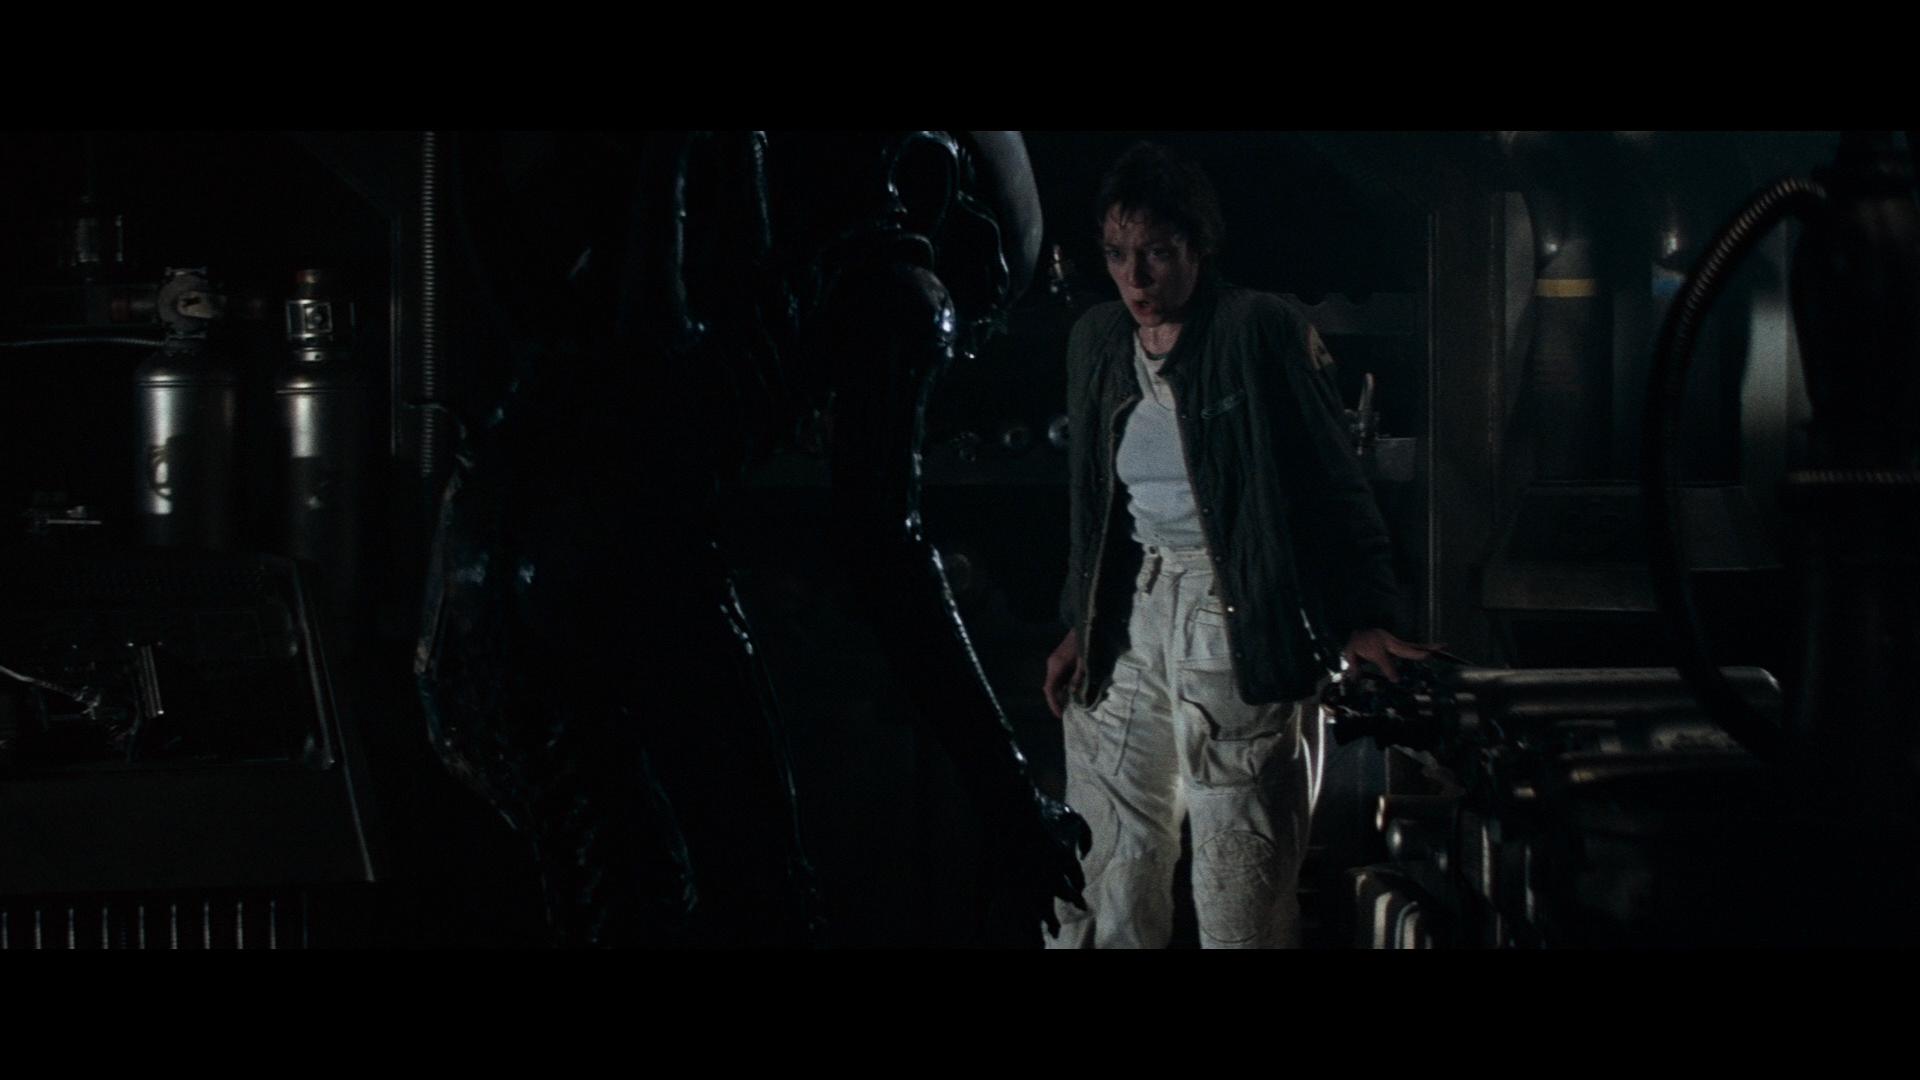 ALIEN (1979) - Nostromo Crew Trousers - Image 7 of 9